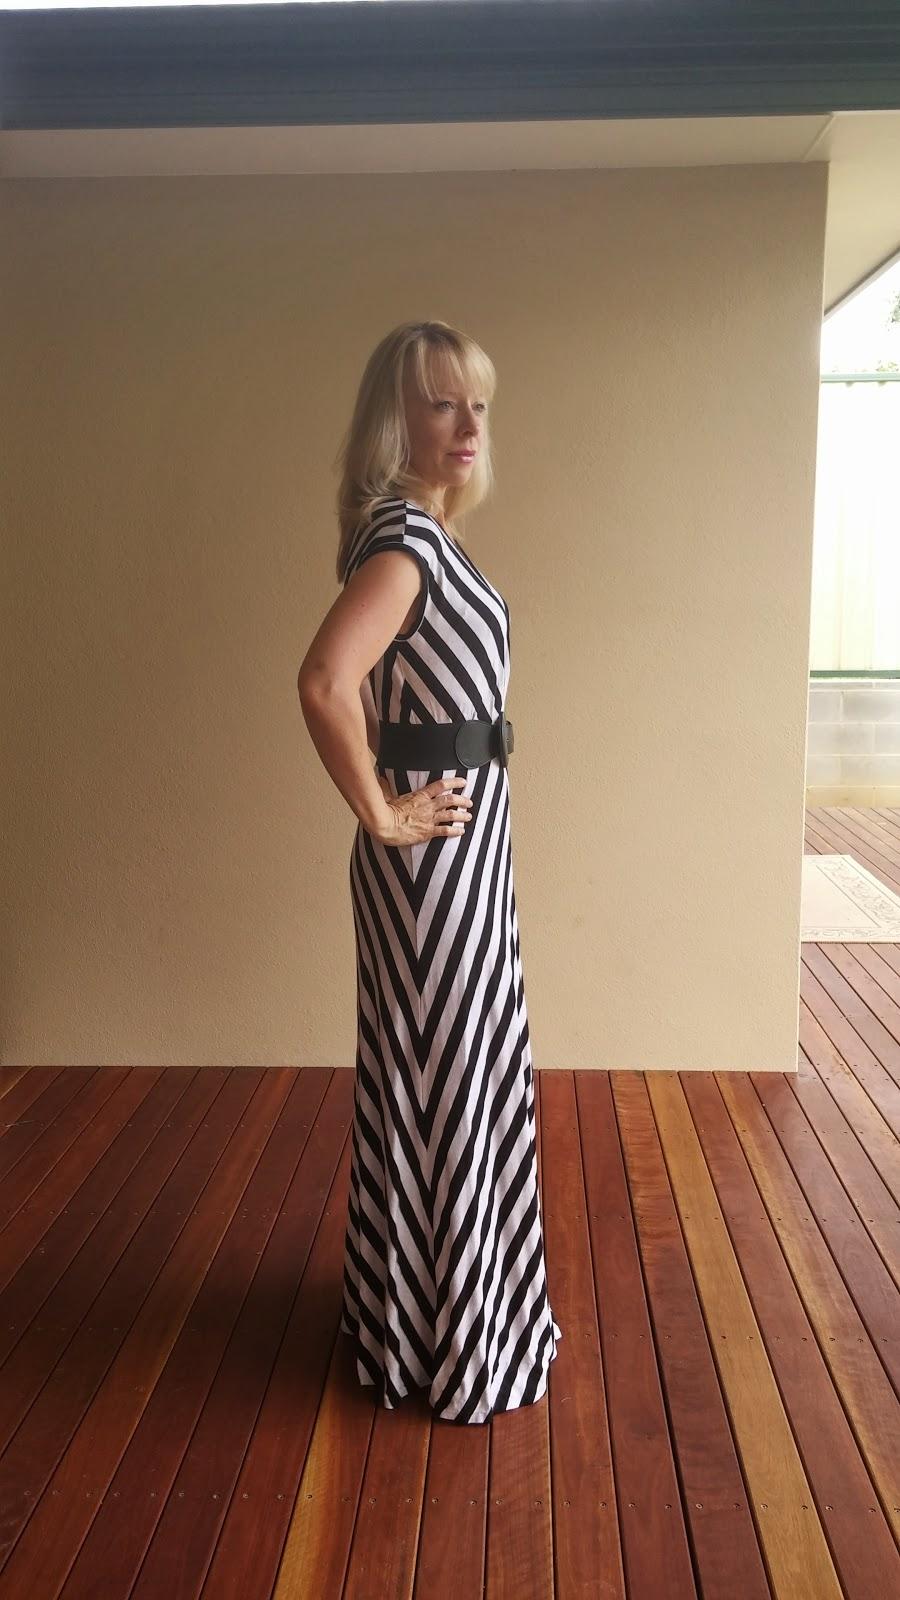 Vogue 1027 with quarter circle skirt maxi skirt